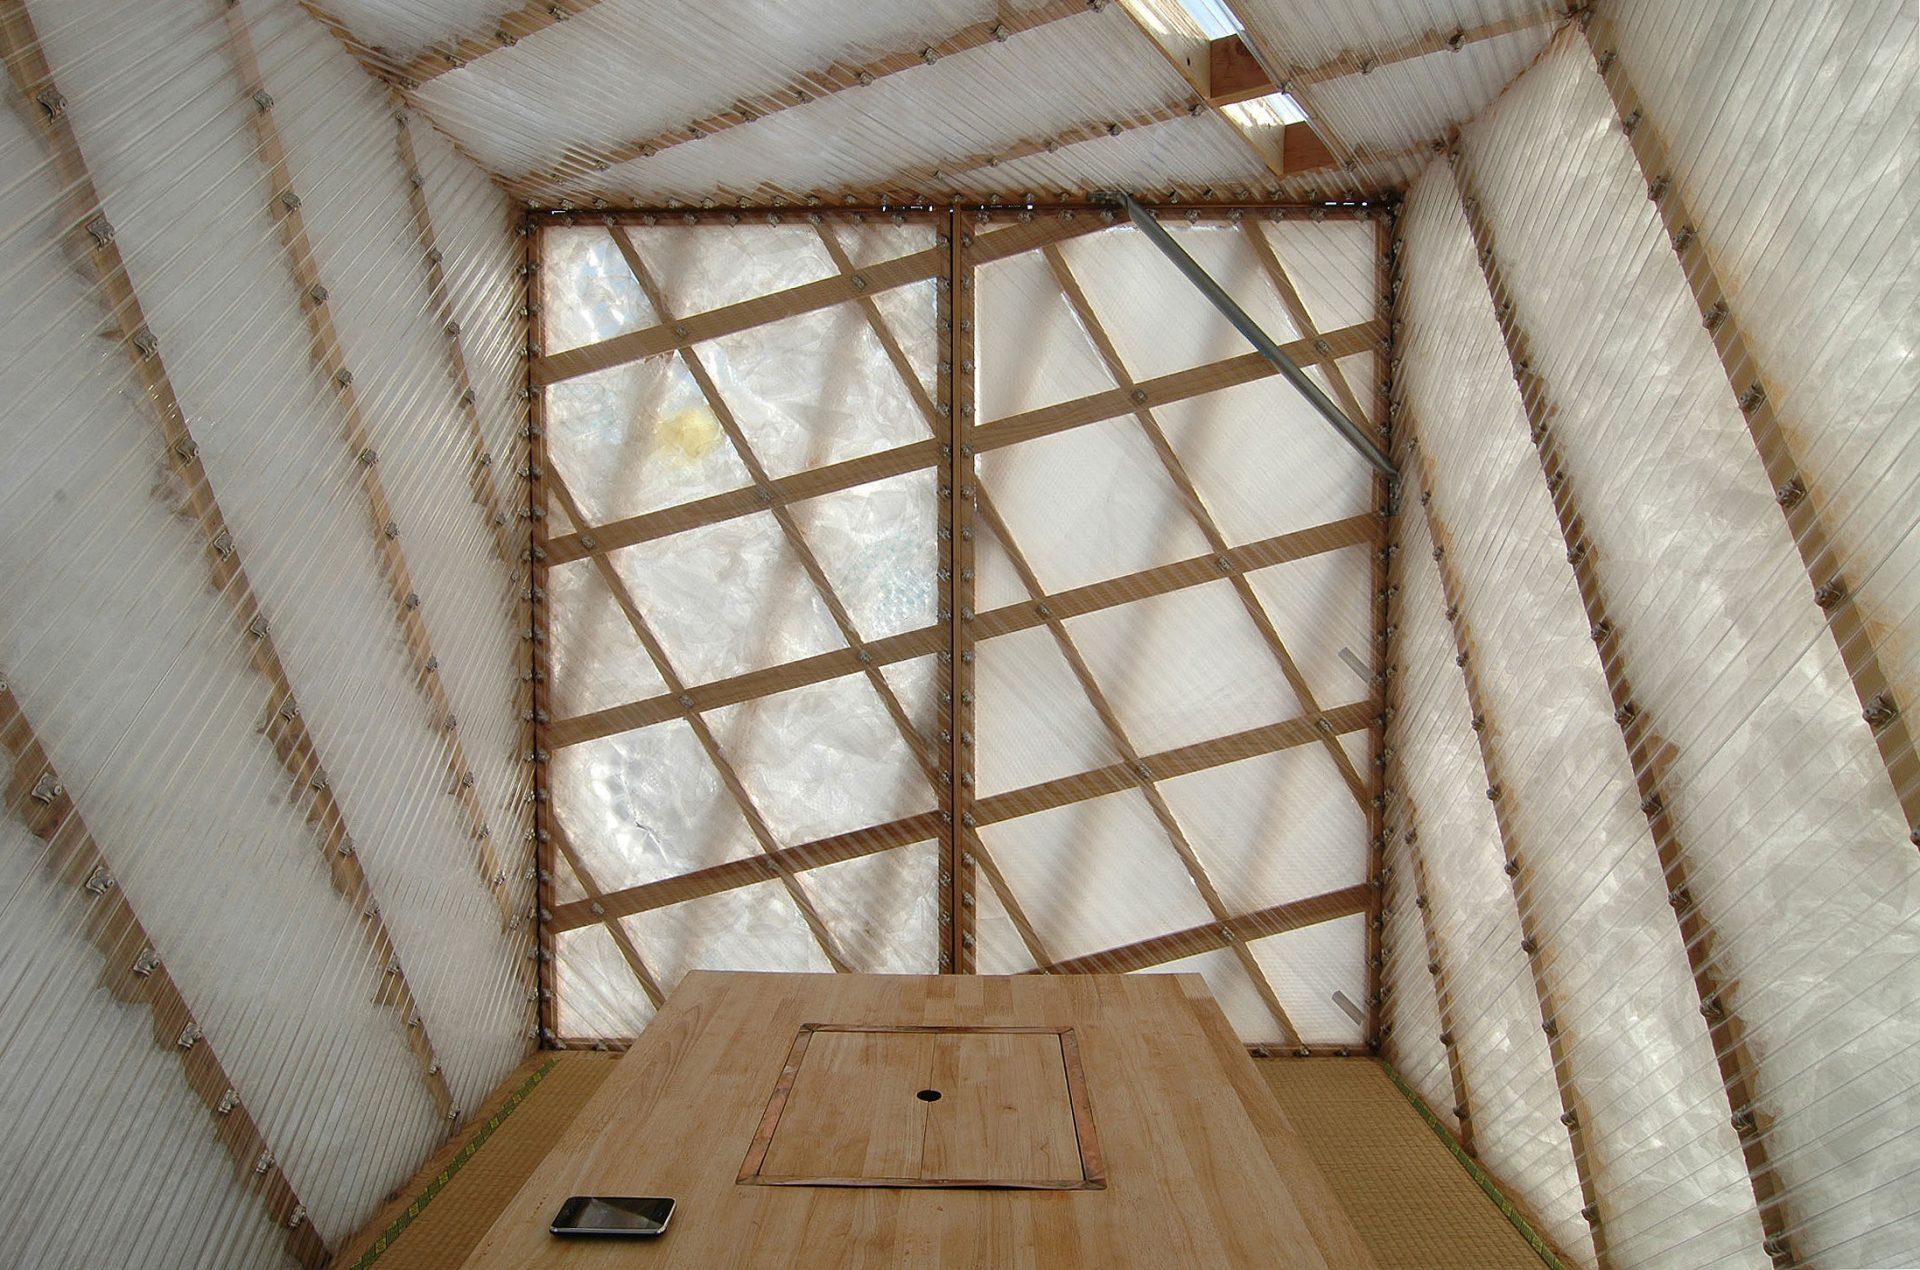 ihouse(insulator house)